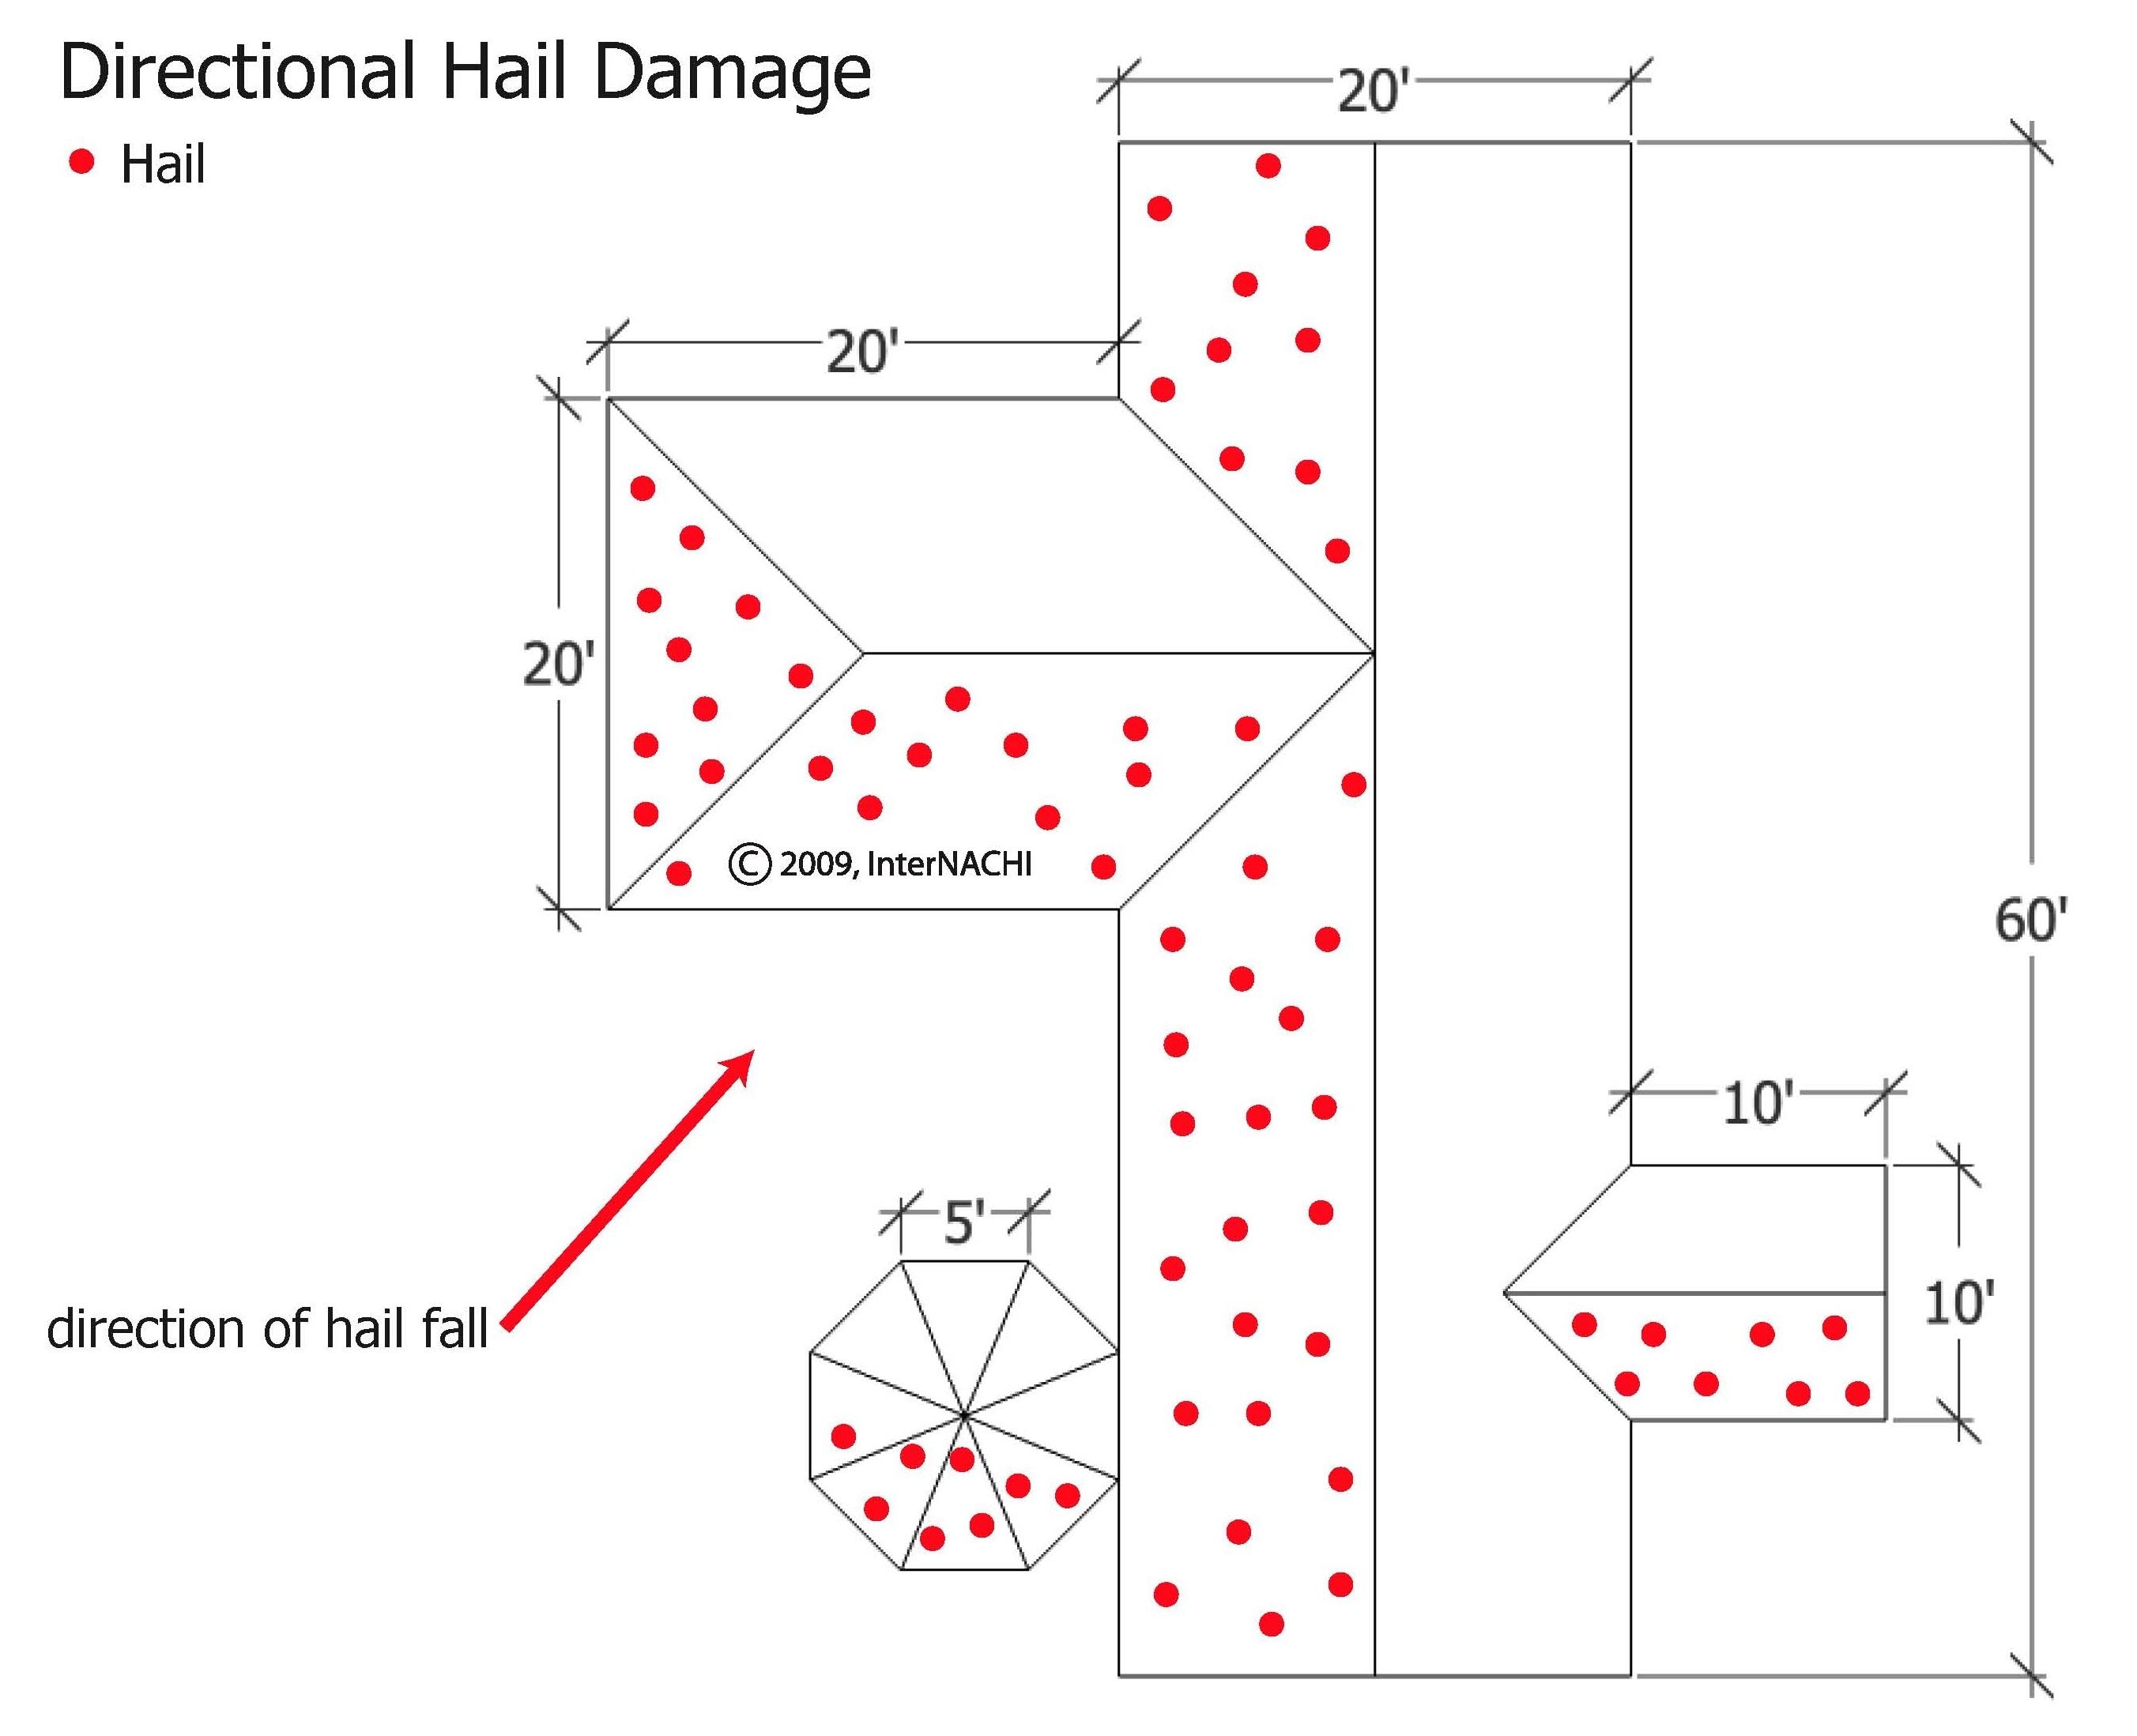 Directional hail damage.